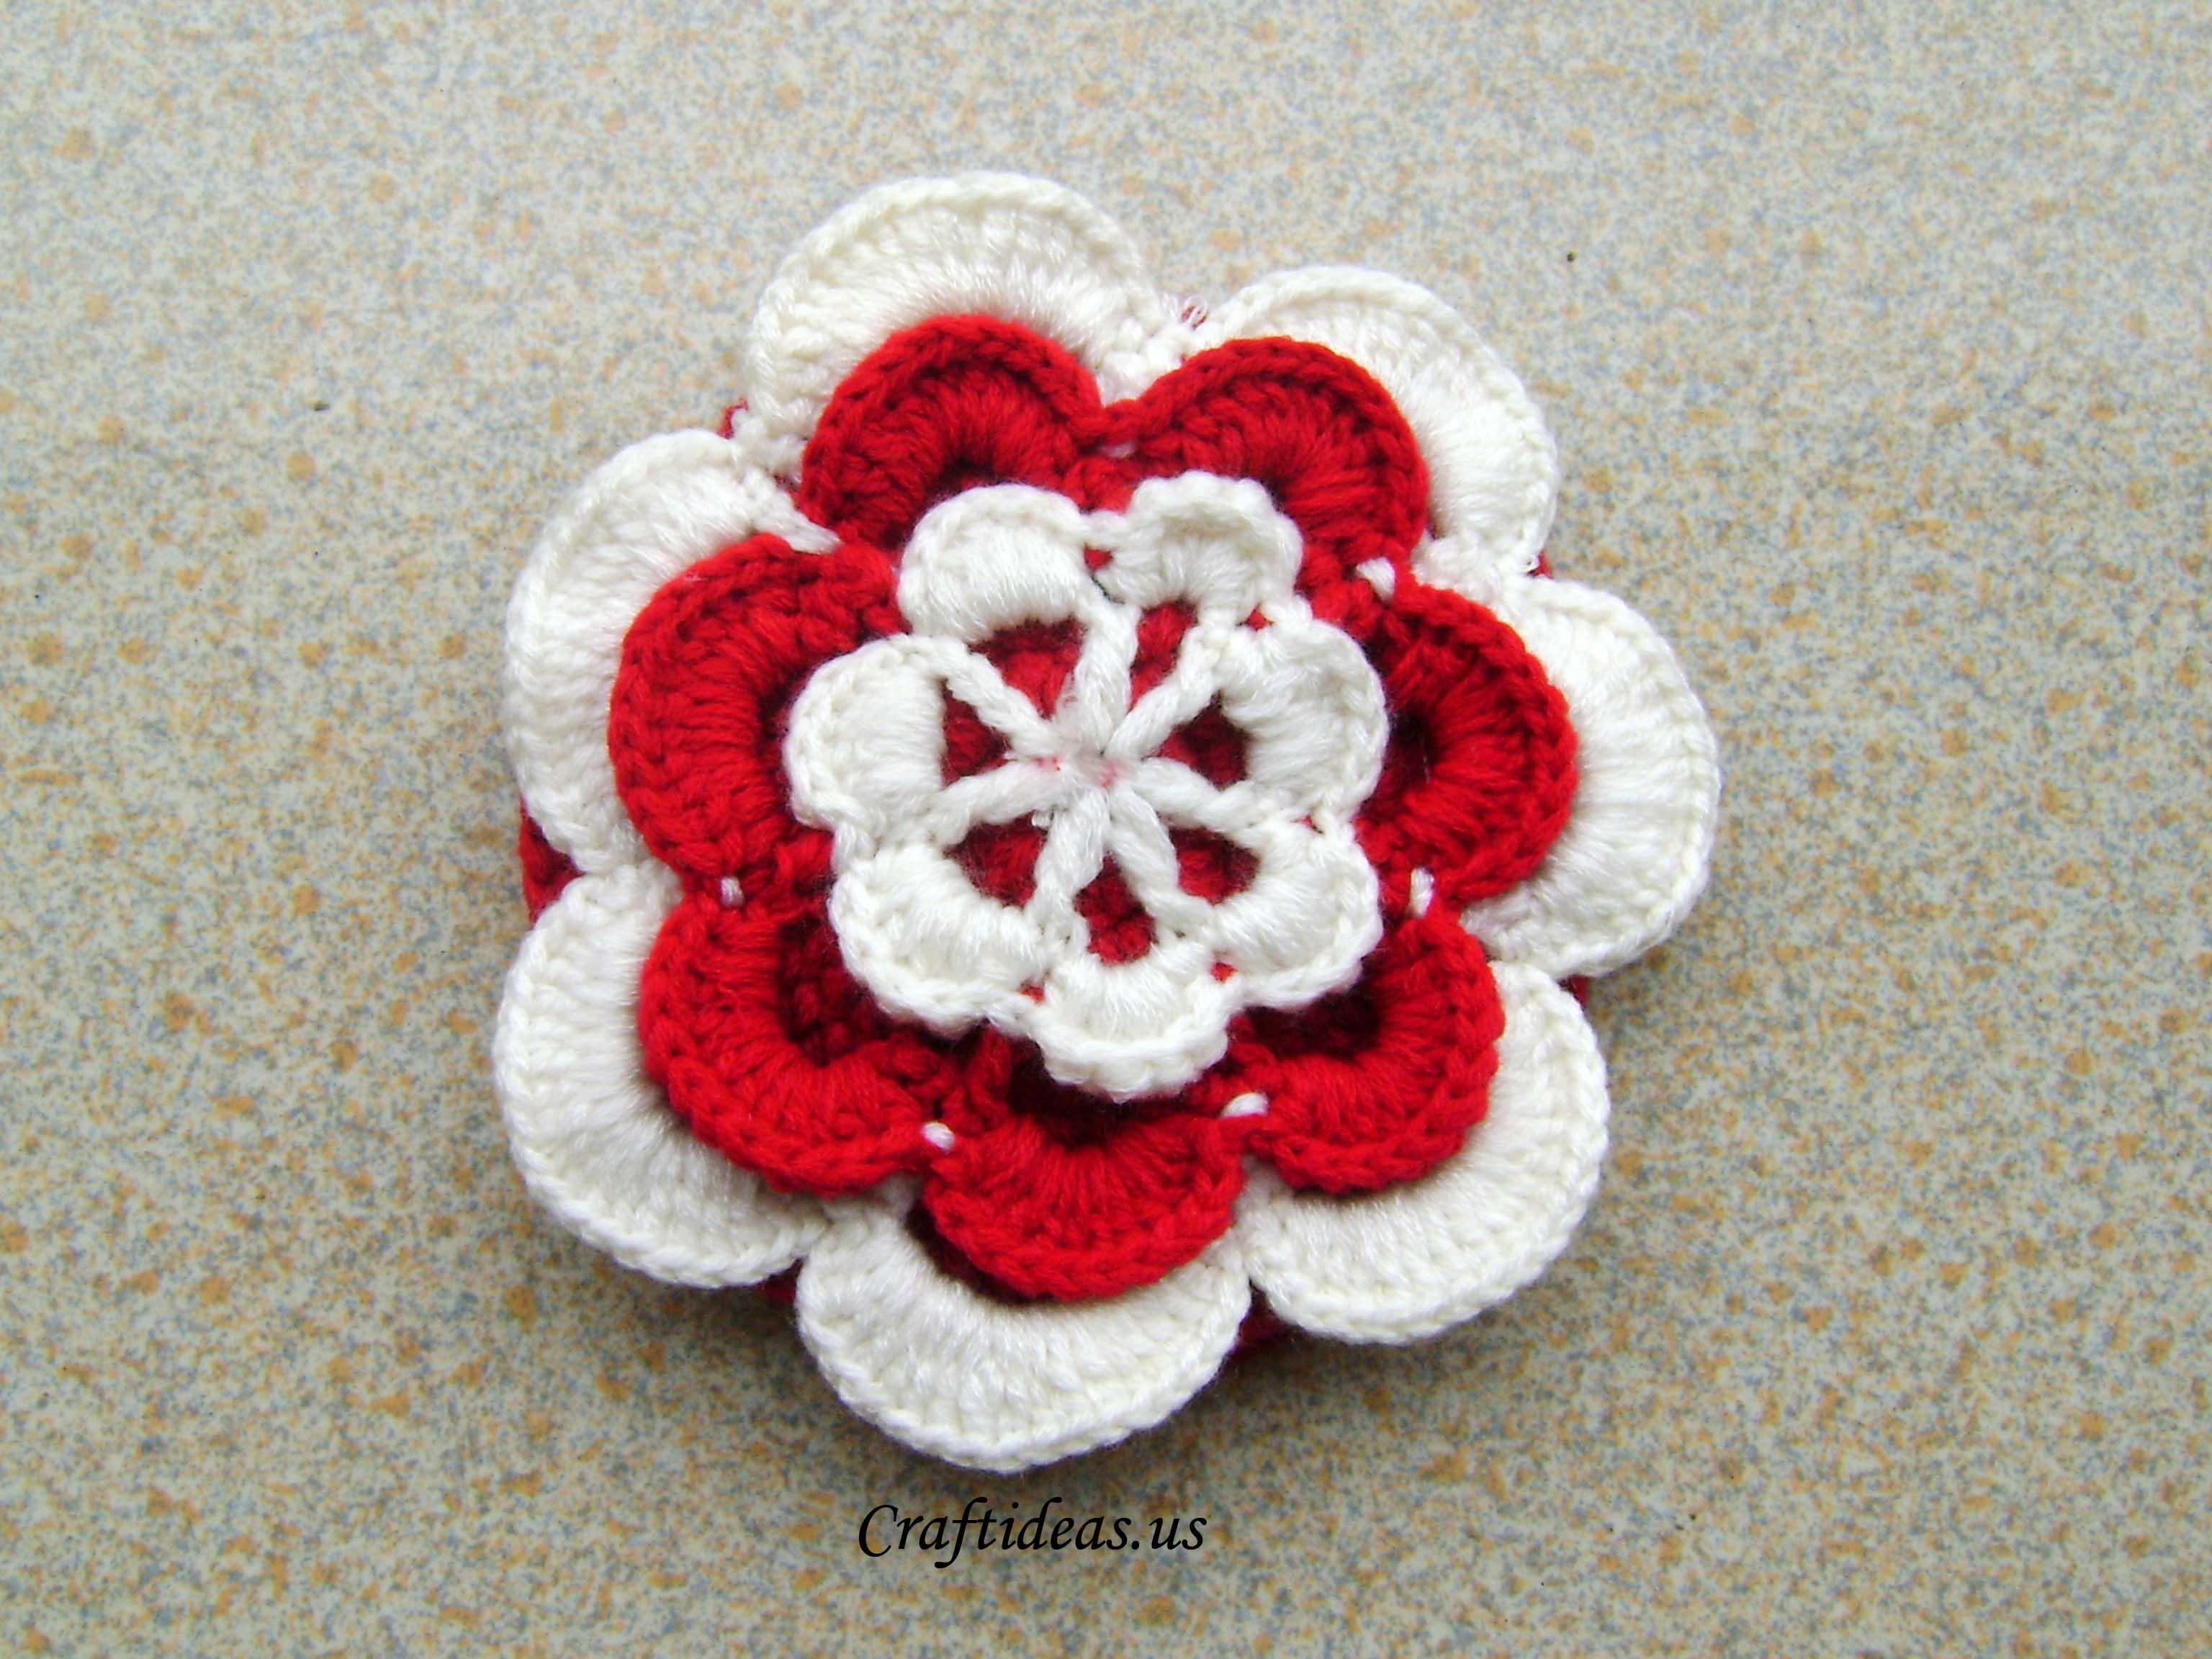 Crochet Simple Flower Tutorial : Crochet flower purse for baby girls - Craft Ideas